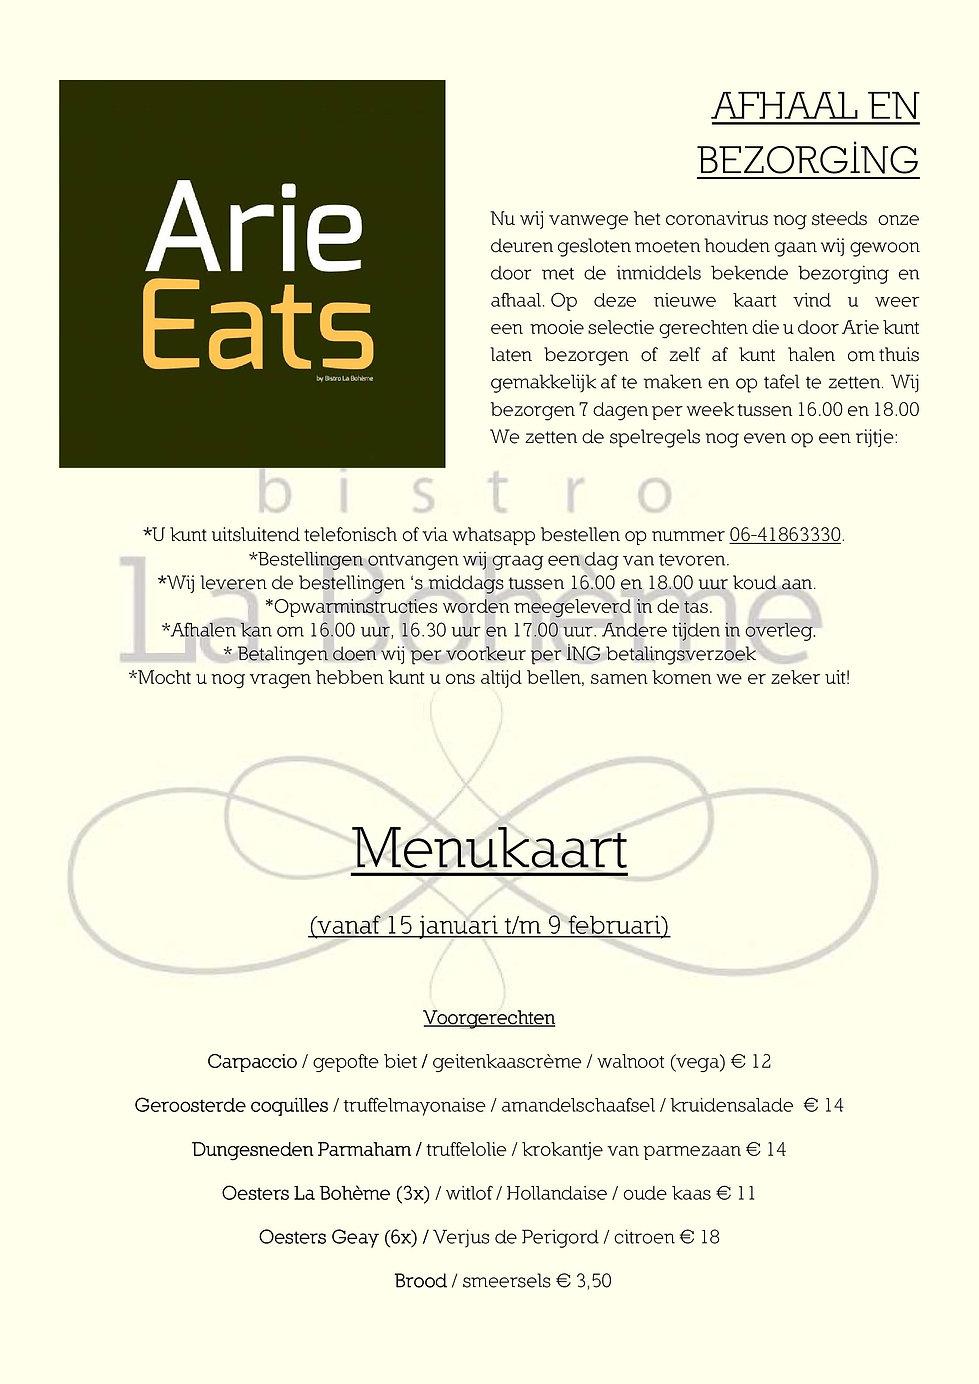 Arie eats afhaal (15januari)-page-001.jp